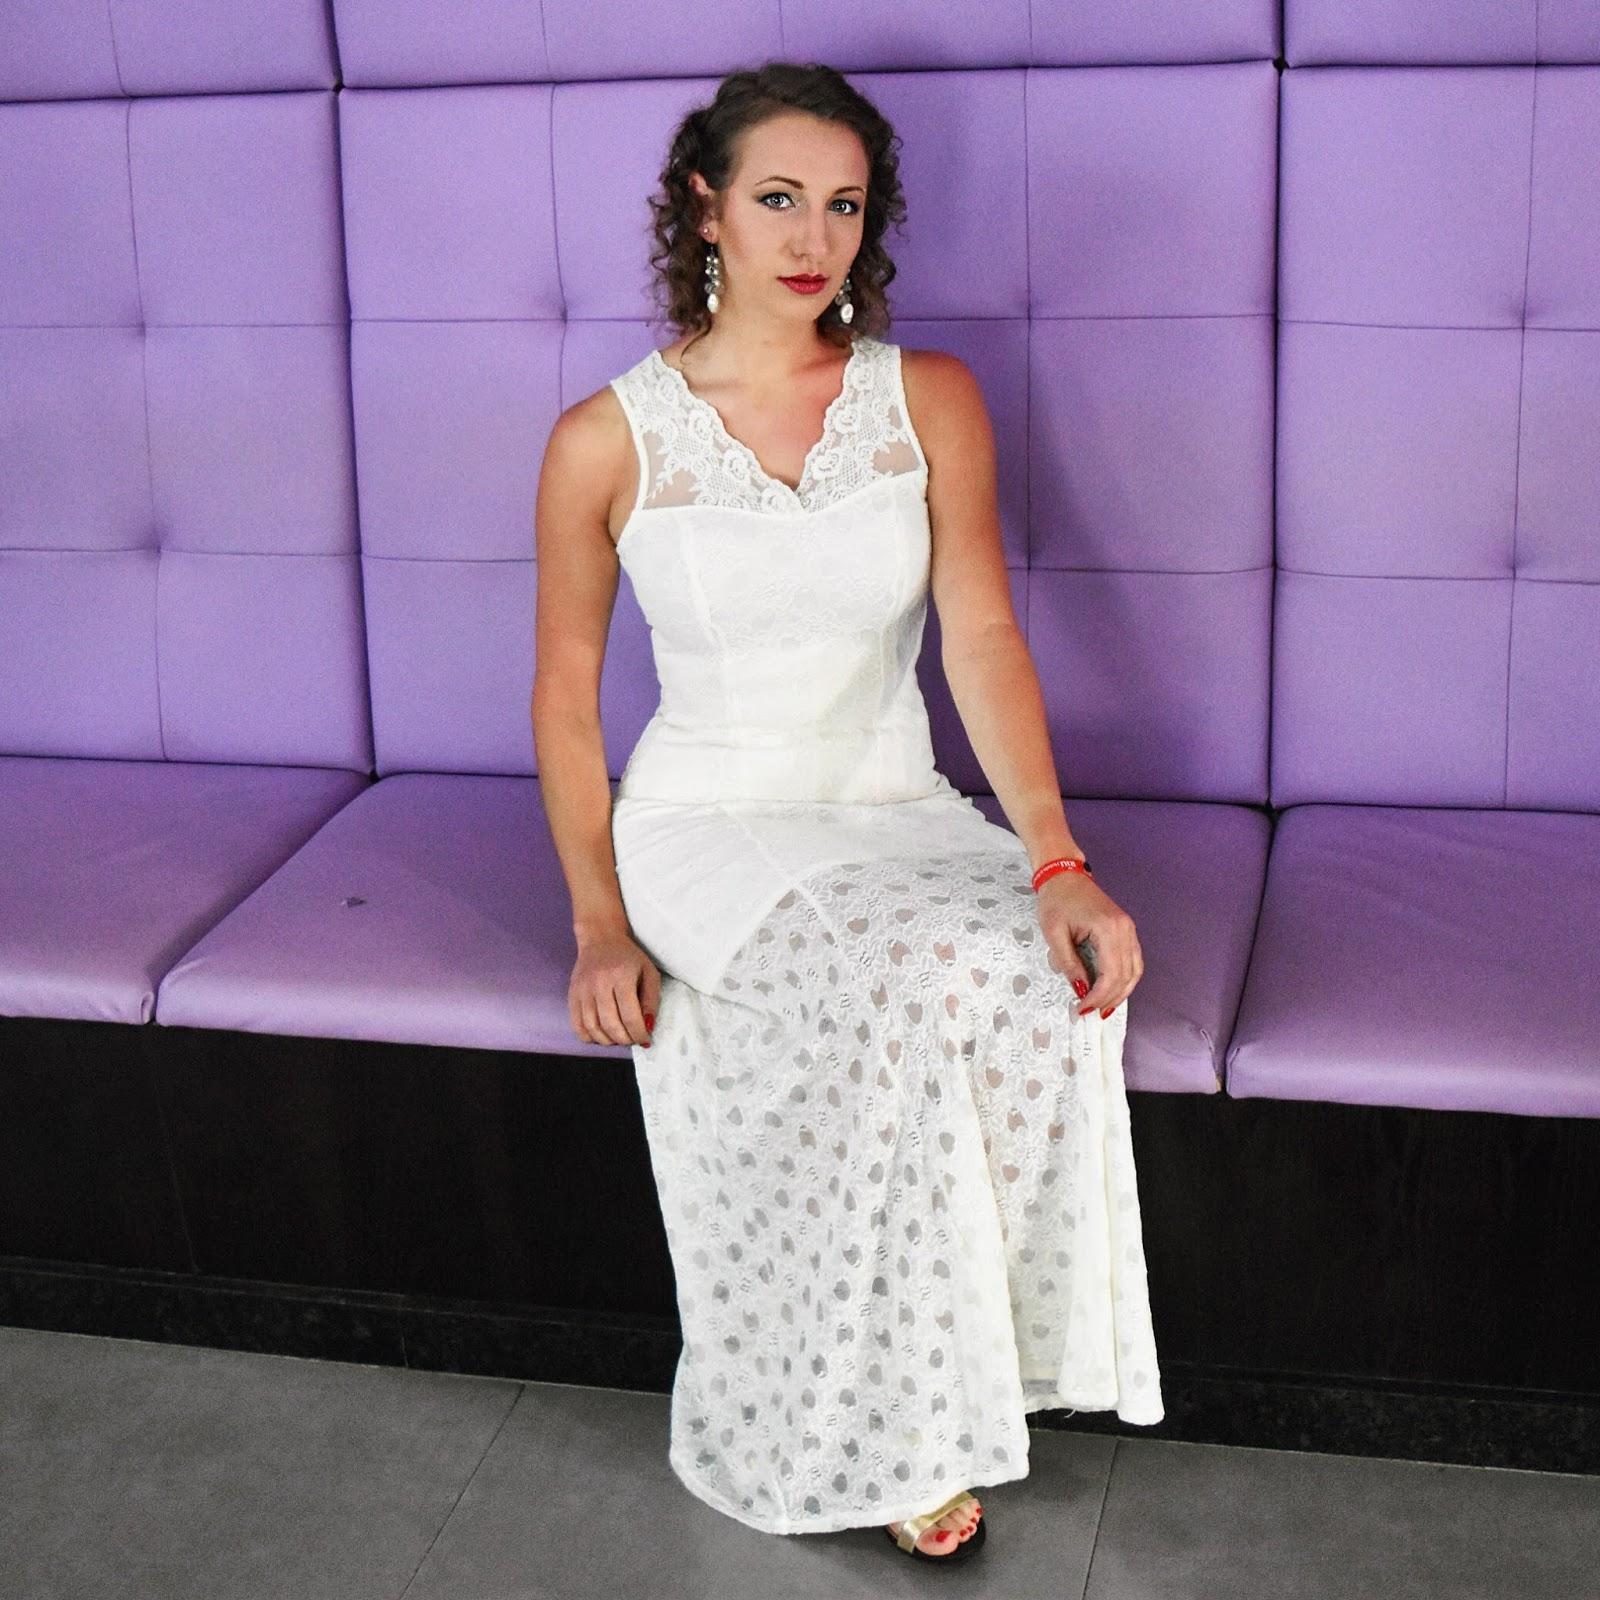 Notorious Nicolette: White Lace